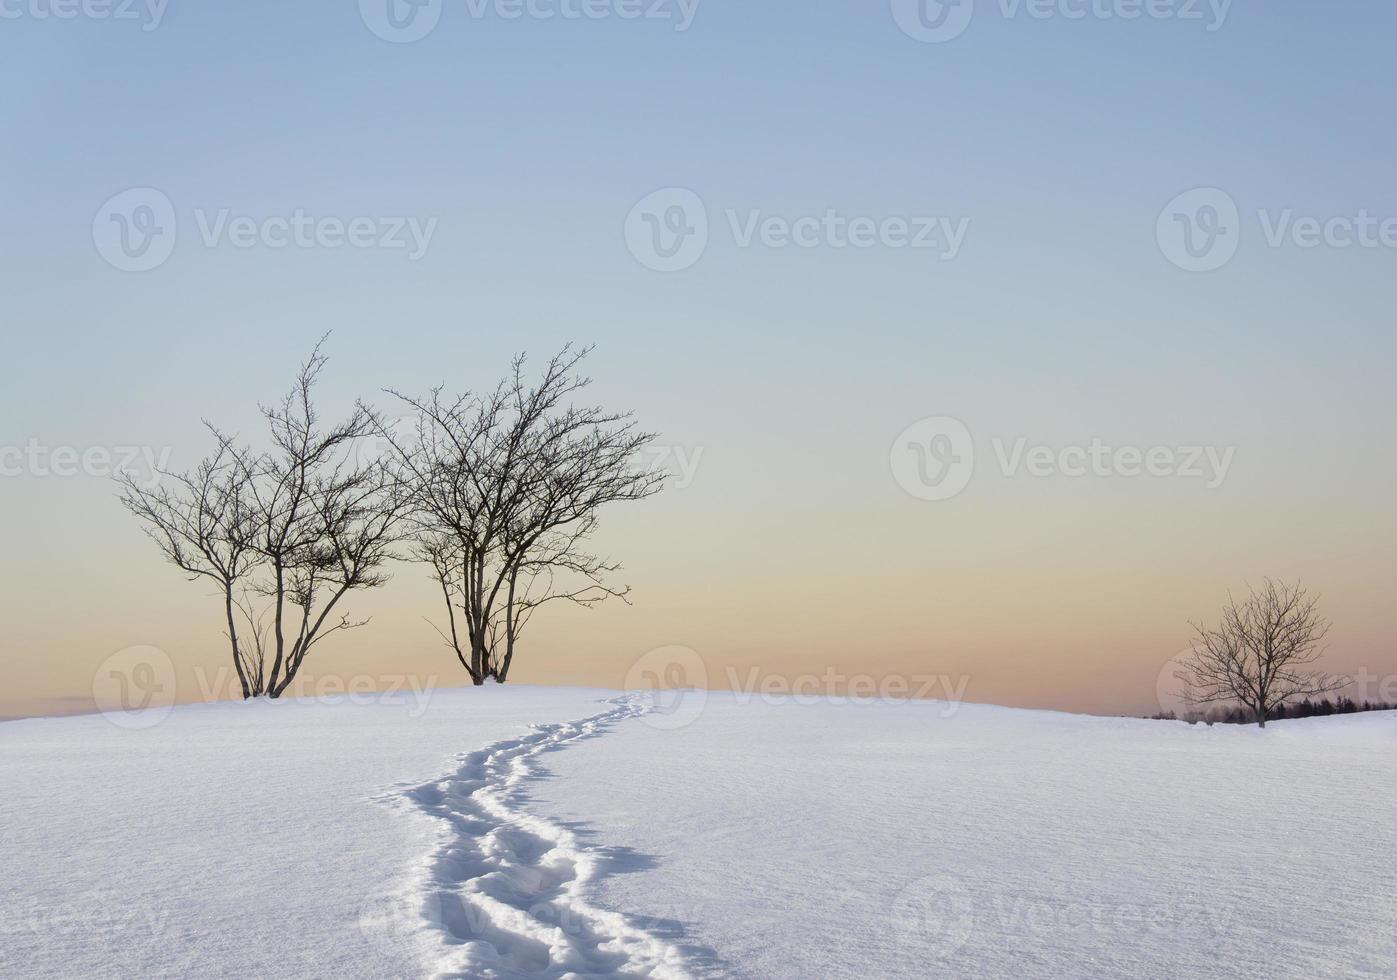 Bare trees in winter landscape photo